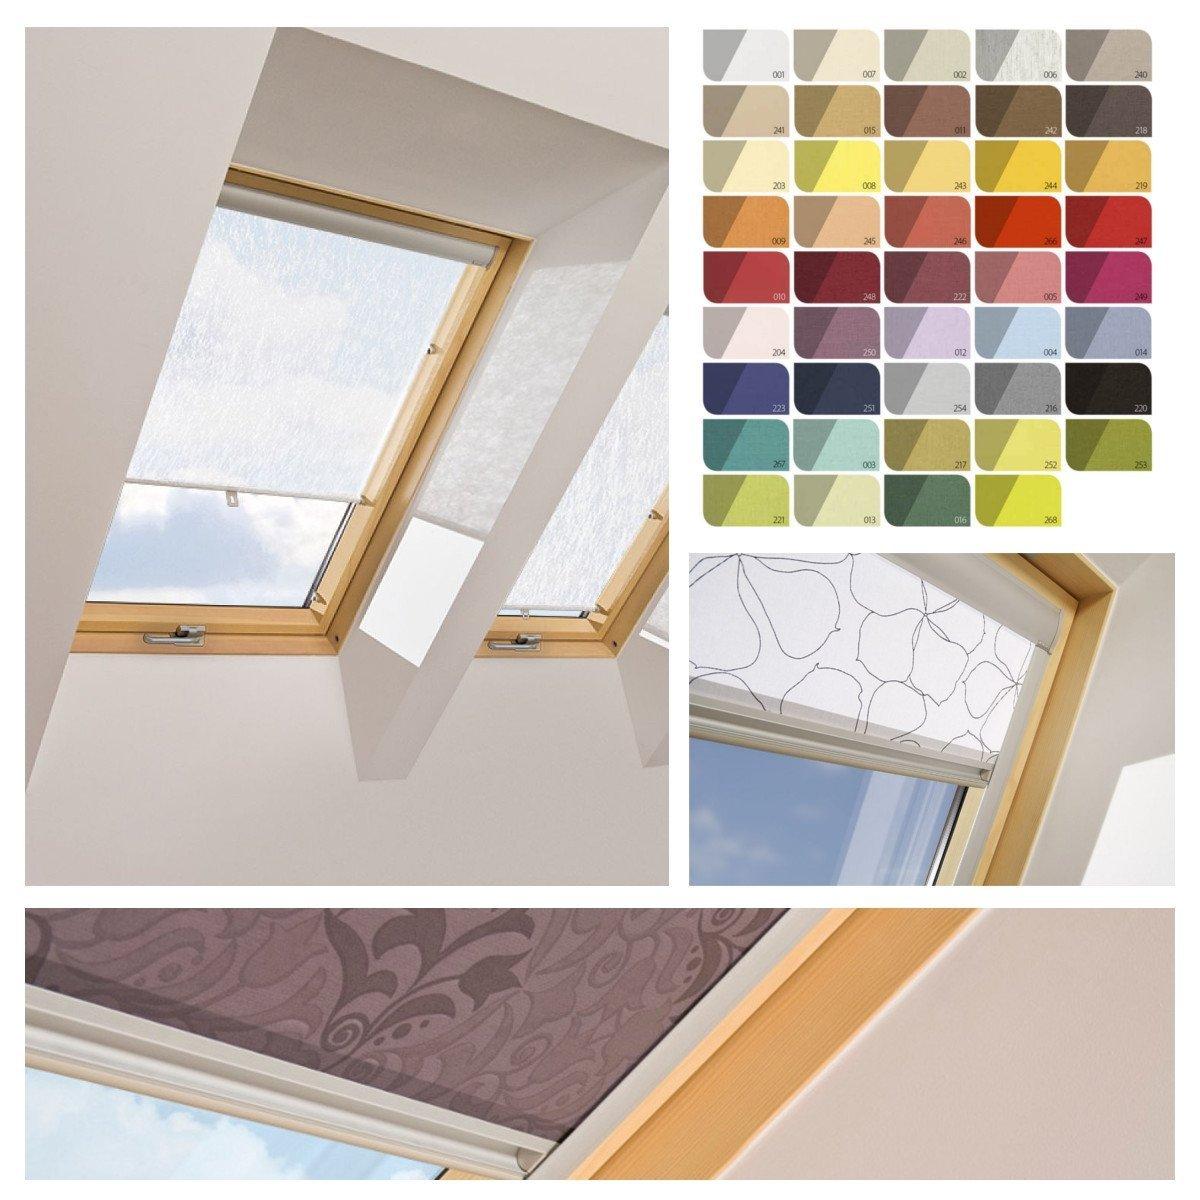 rollo komfort fakro arp zubeh r f r dachfenster i preisgruppe rollo fakro innenzubeh r. Black Bedroom Furniture Sets. Home Design Ideas